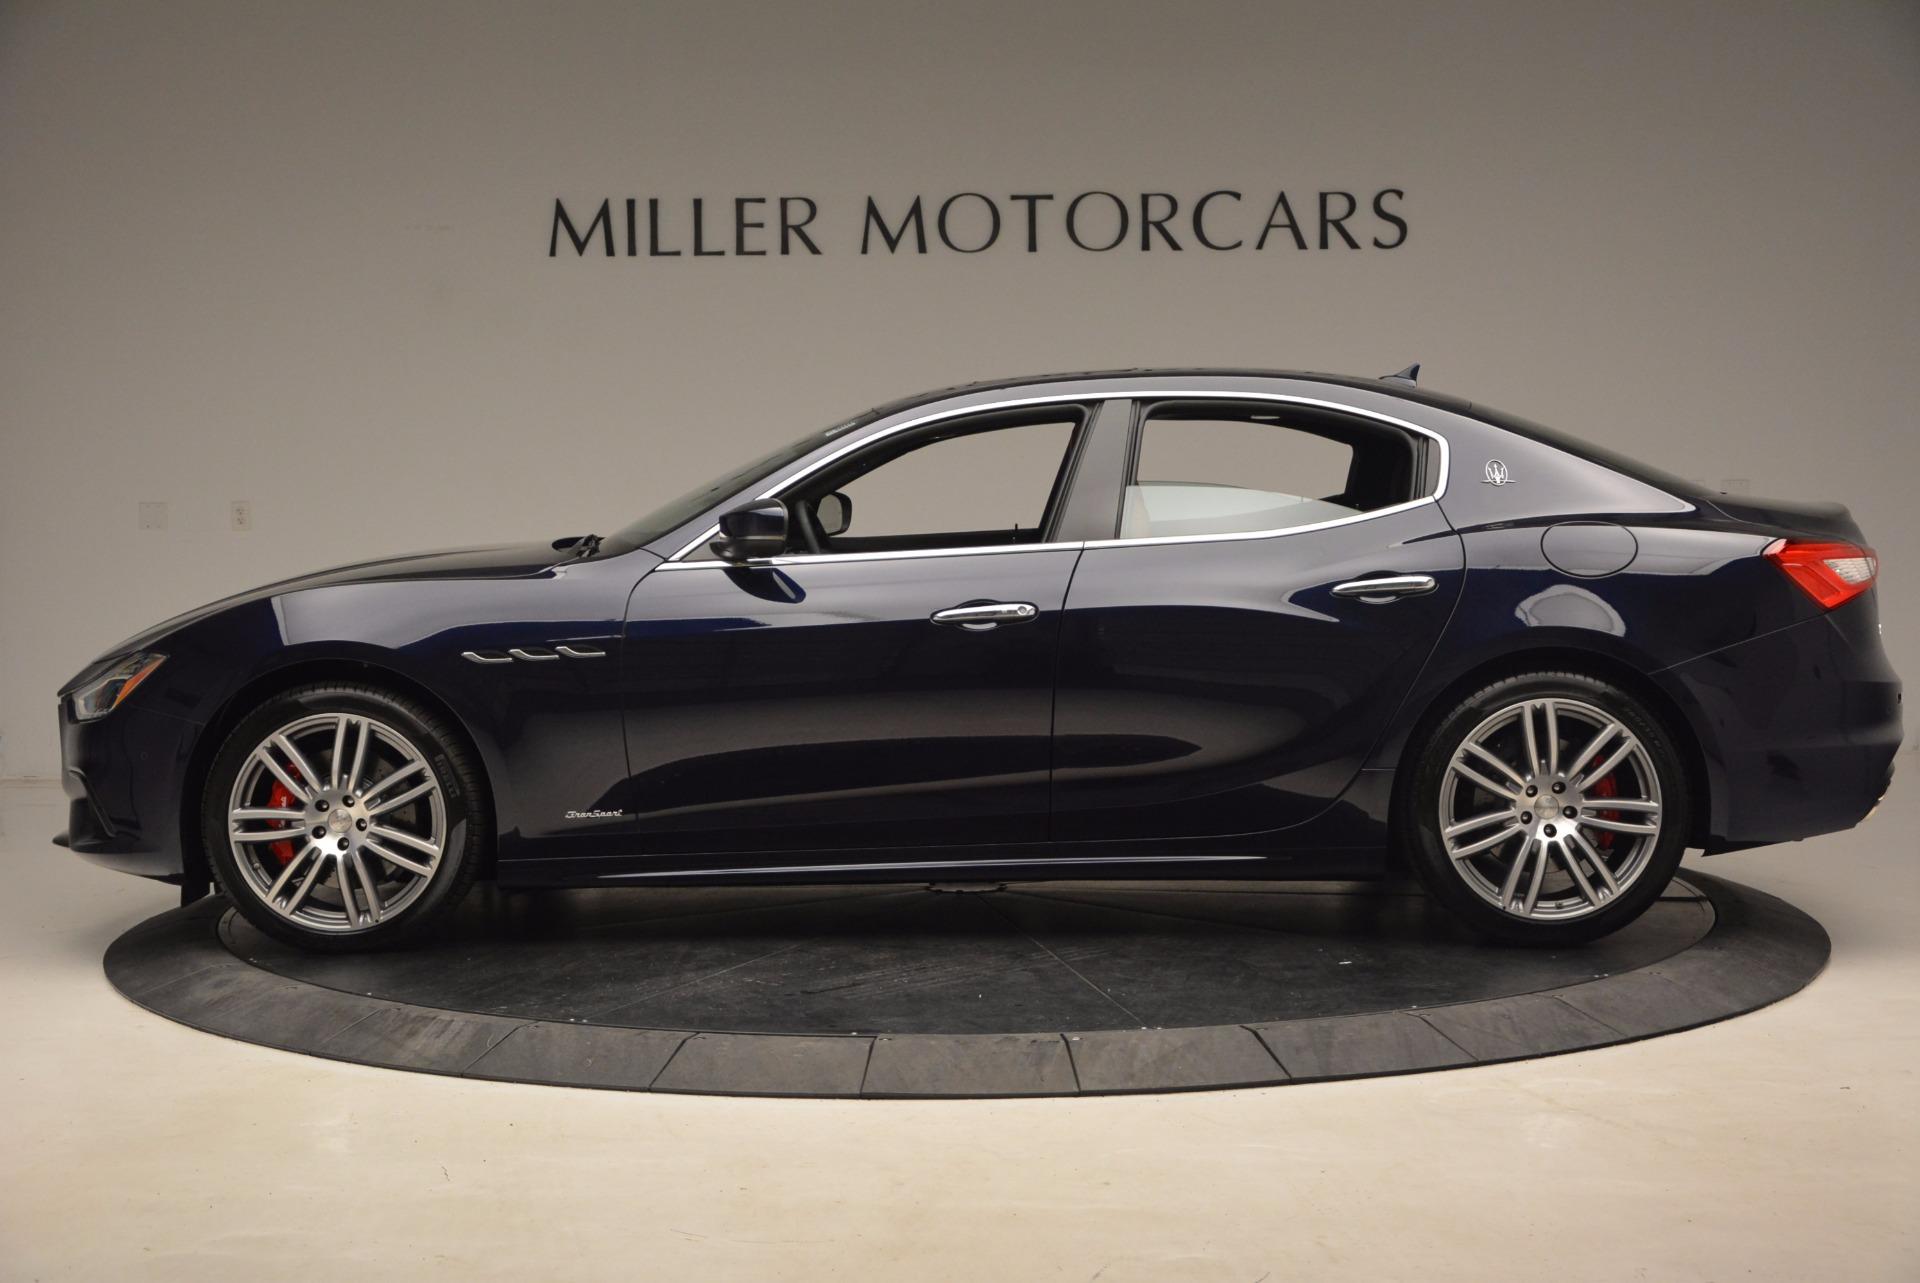 New 2018 Maserati Ghibli S Q4 Gransport For Sale In Westport, CT 1562_p3